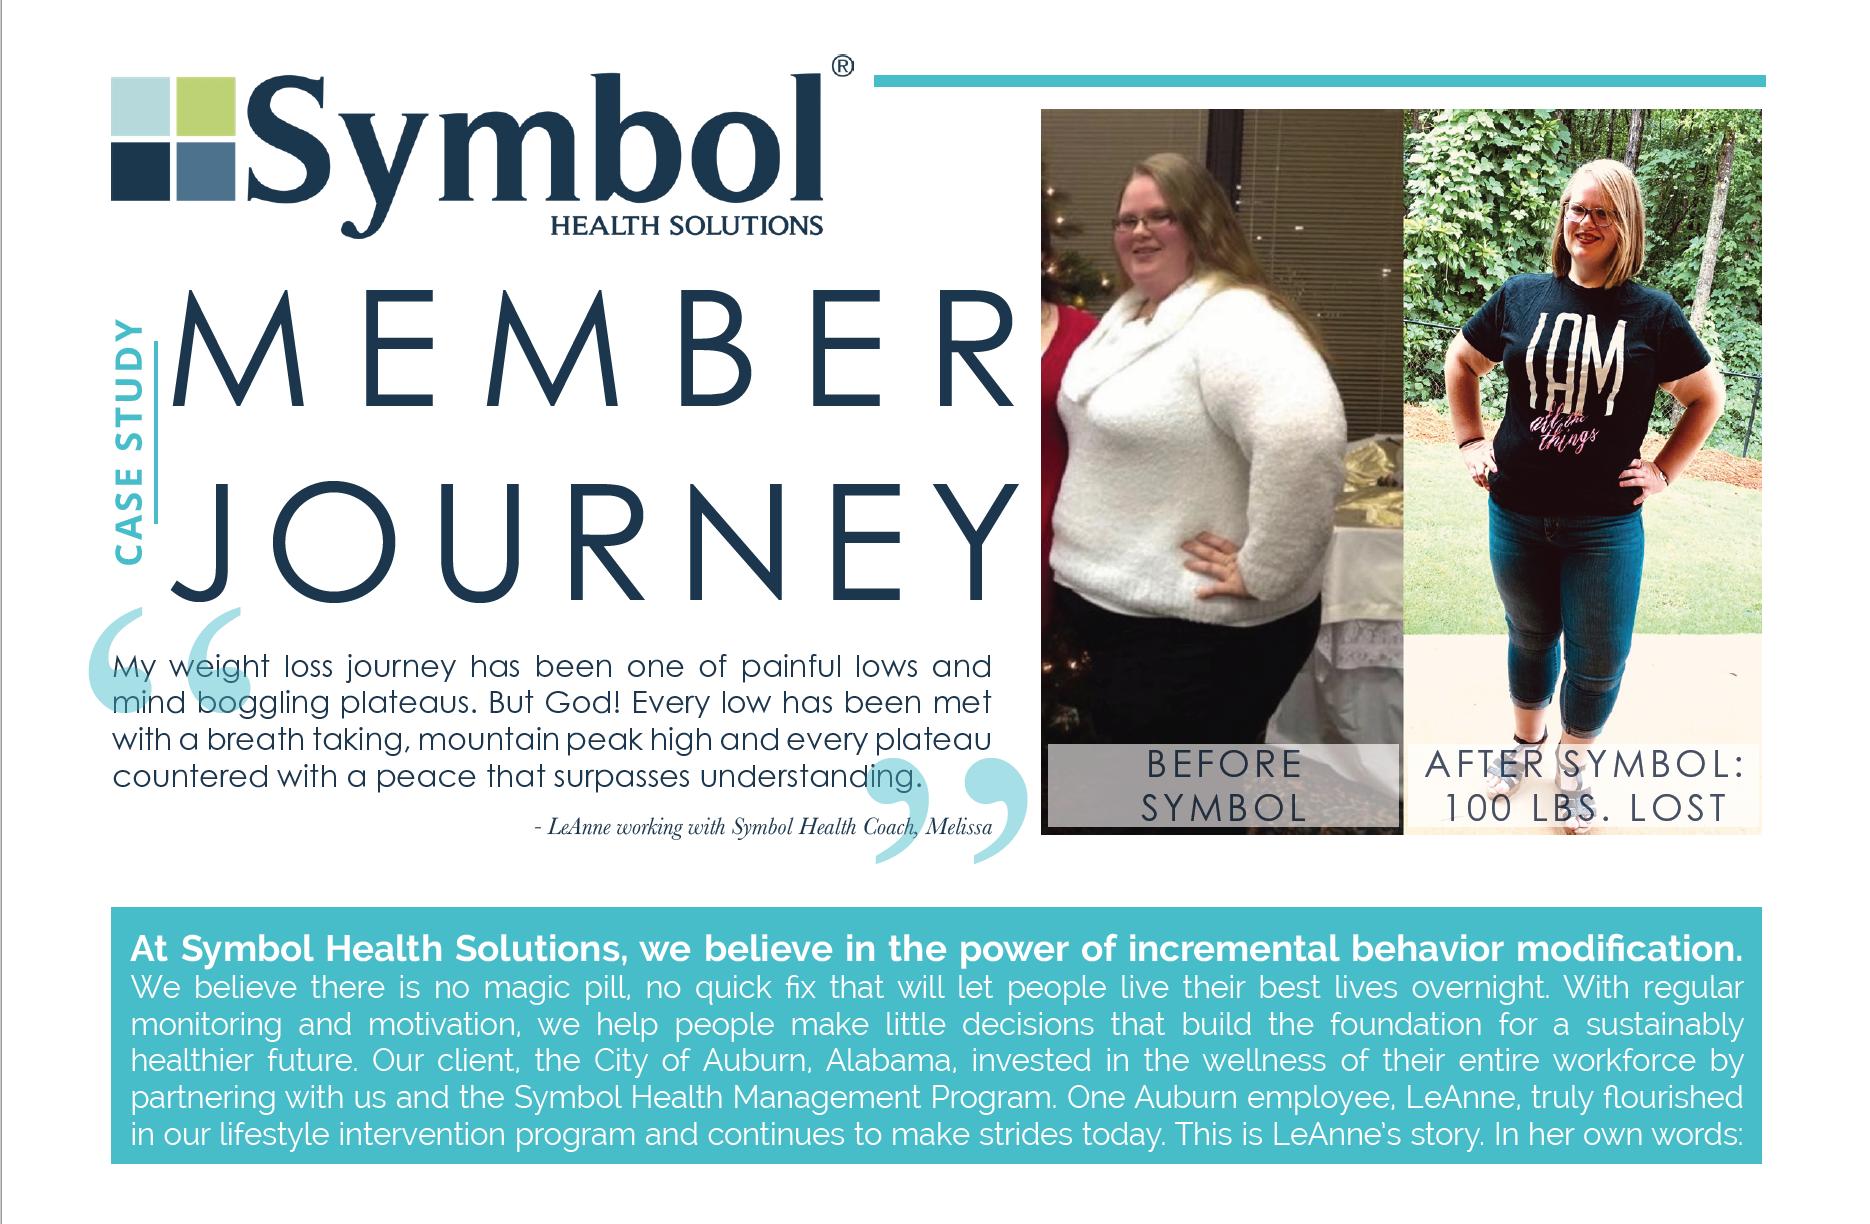 130lb Weight Loss Symbol Member Journey